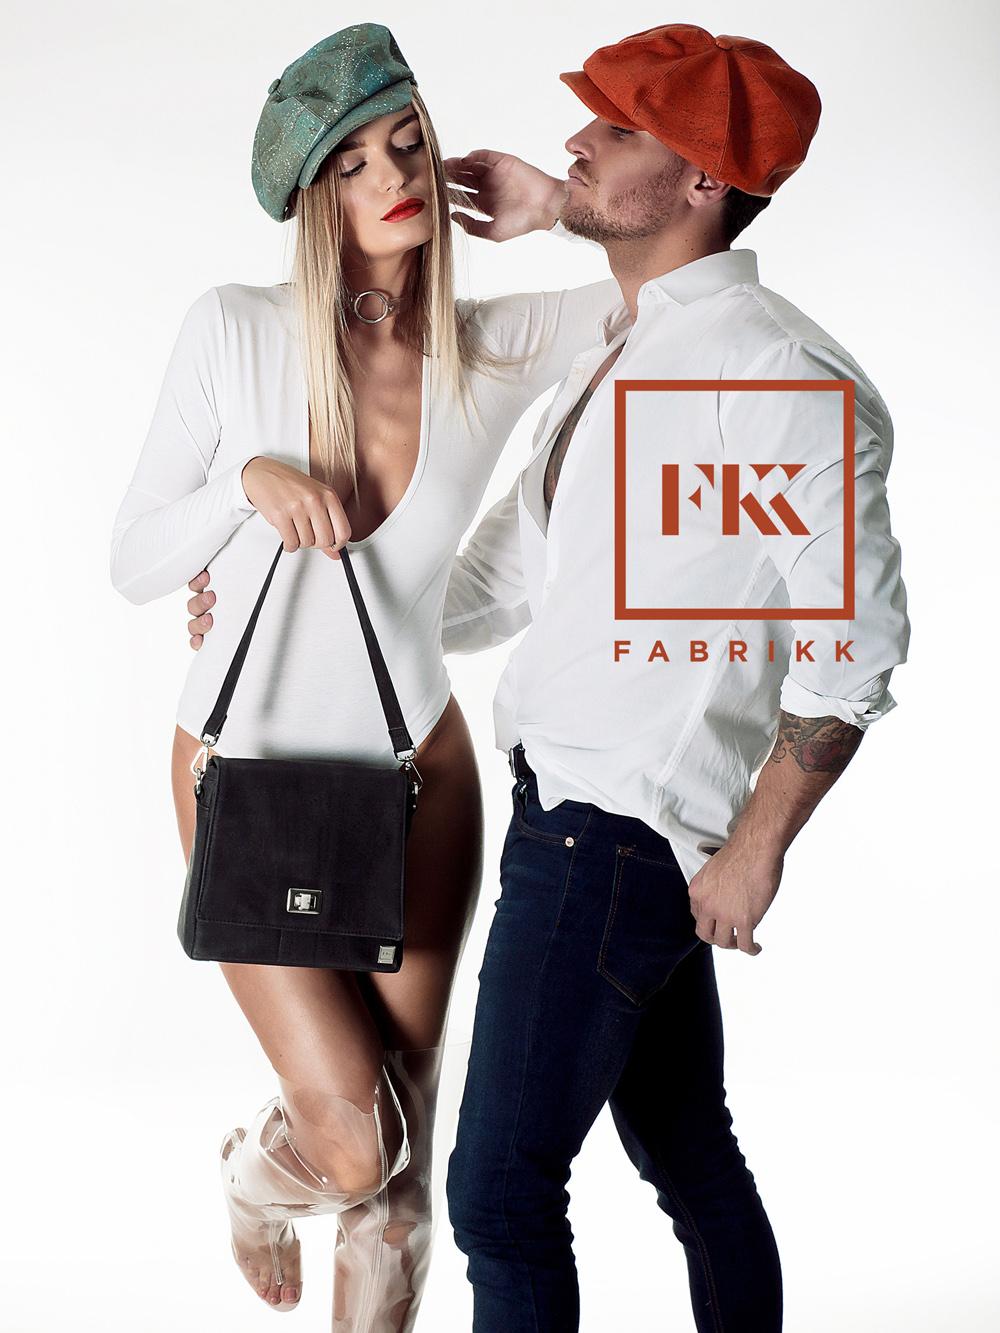 Fabrikk campaign SS17 ft Tom Zanetti and Anna Tyburska shot by Studio Voir 4